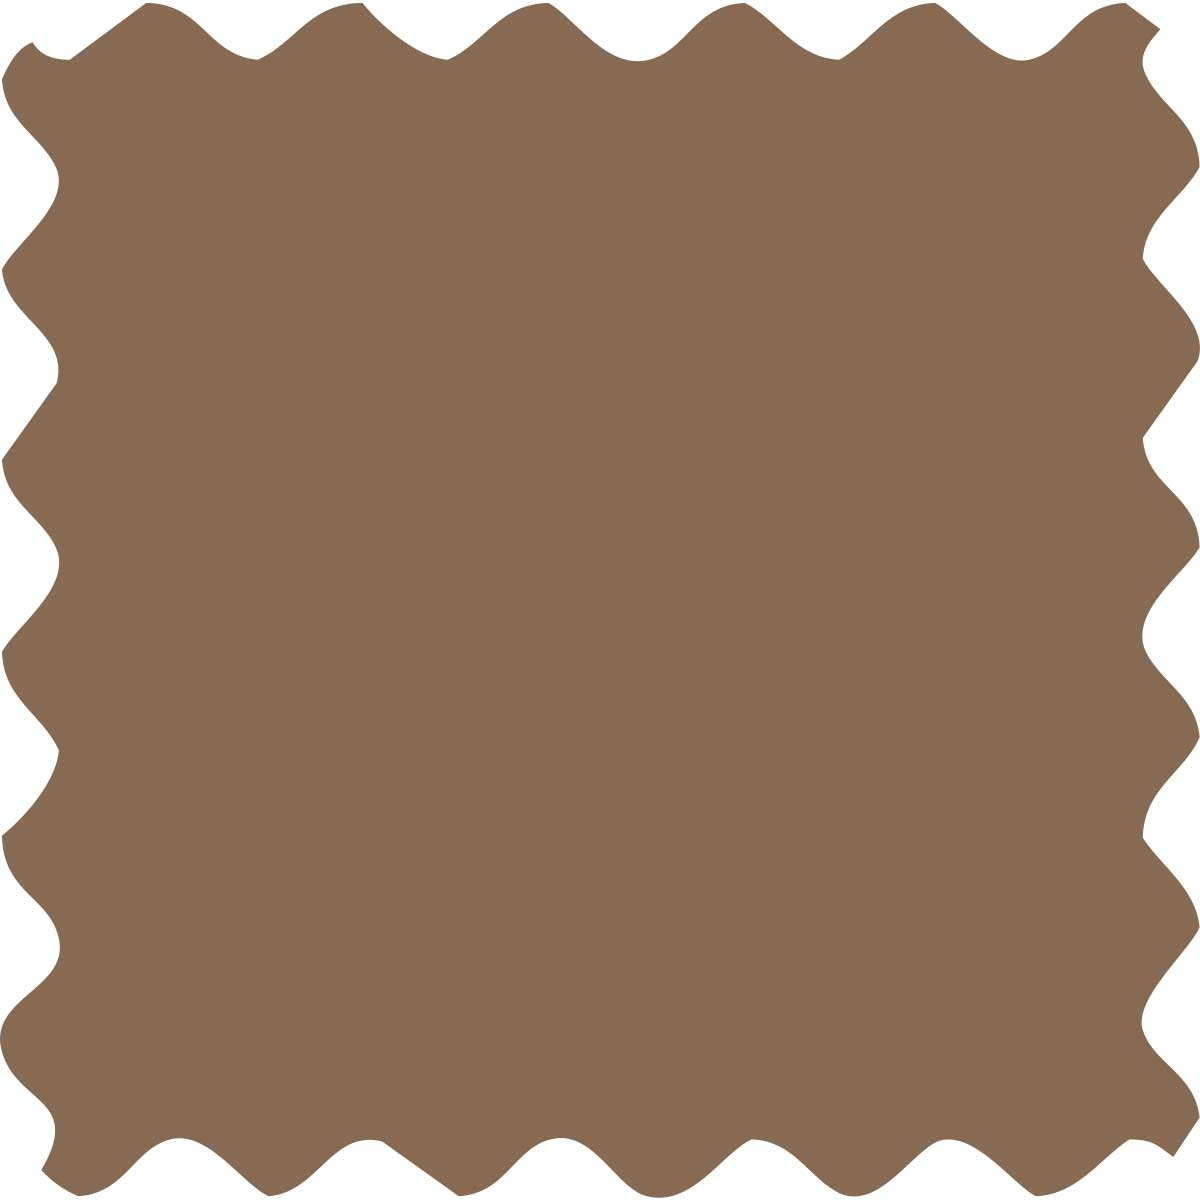 Fabric Creations™ Soft Fabric Inks - Metallic Bronze, 2 oz.